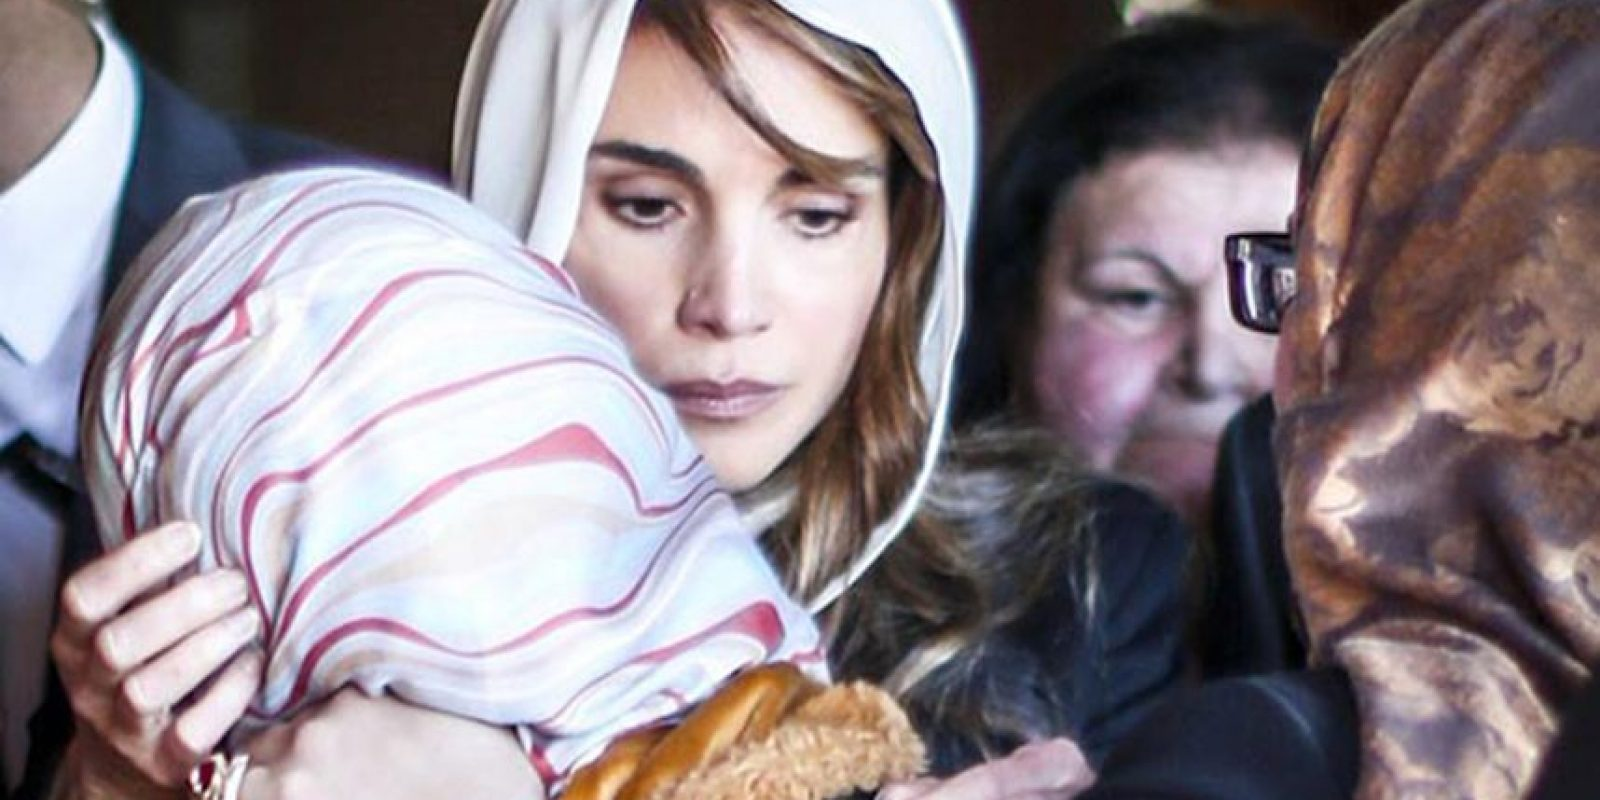 La reina Rania de Jordania consuela a la esposa del piloto asesinado. Foto:AFP